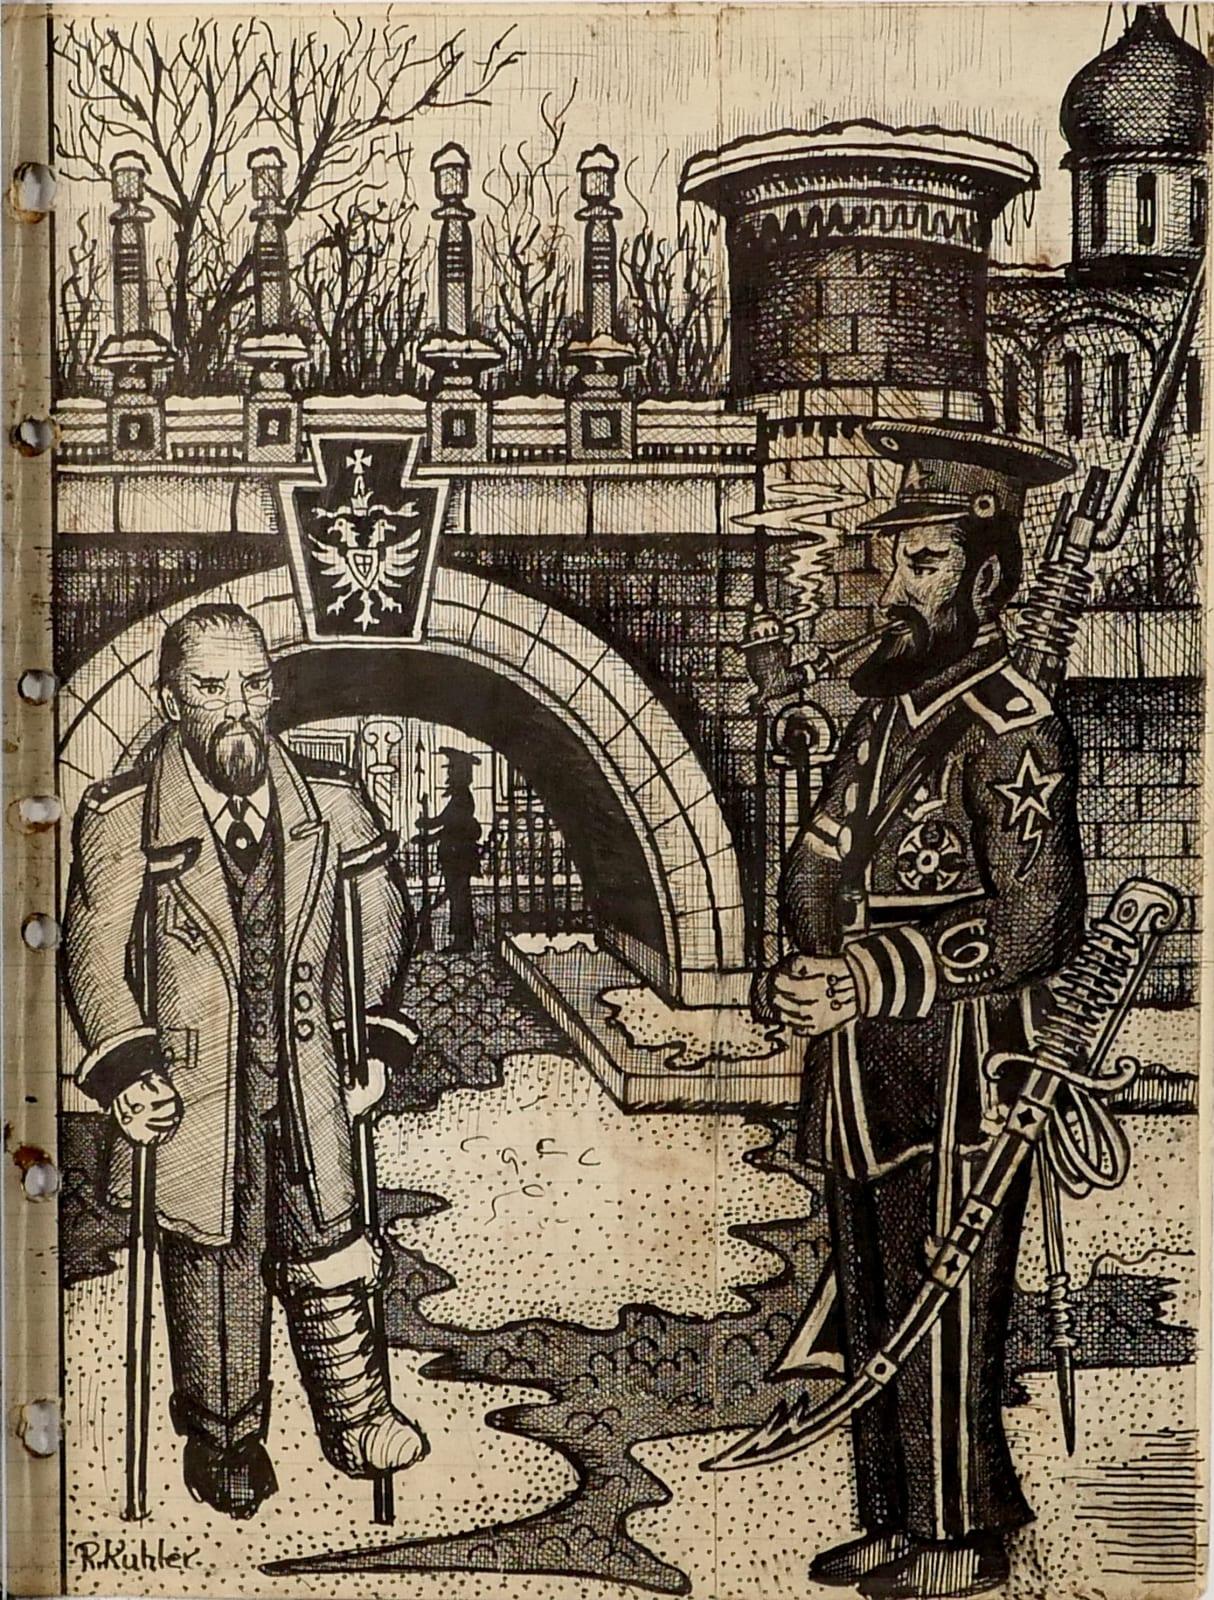 Kahn on crutches with Josef Wepka inside Ciudella gate, 1955 Black ink on sketch paper 11 x 8 1/2 in. (RK 126) $7,000